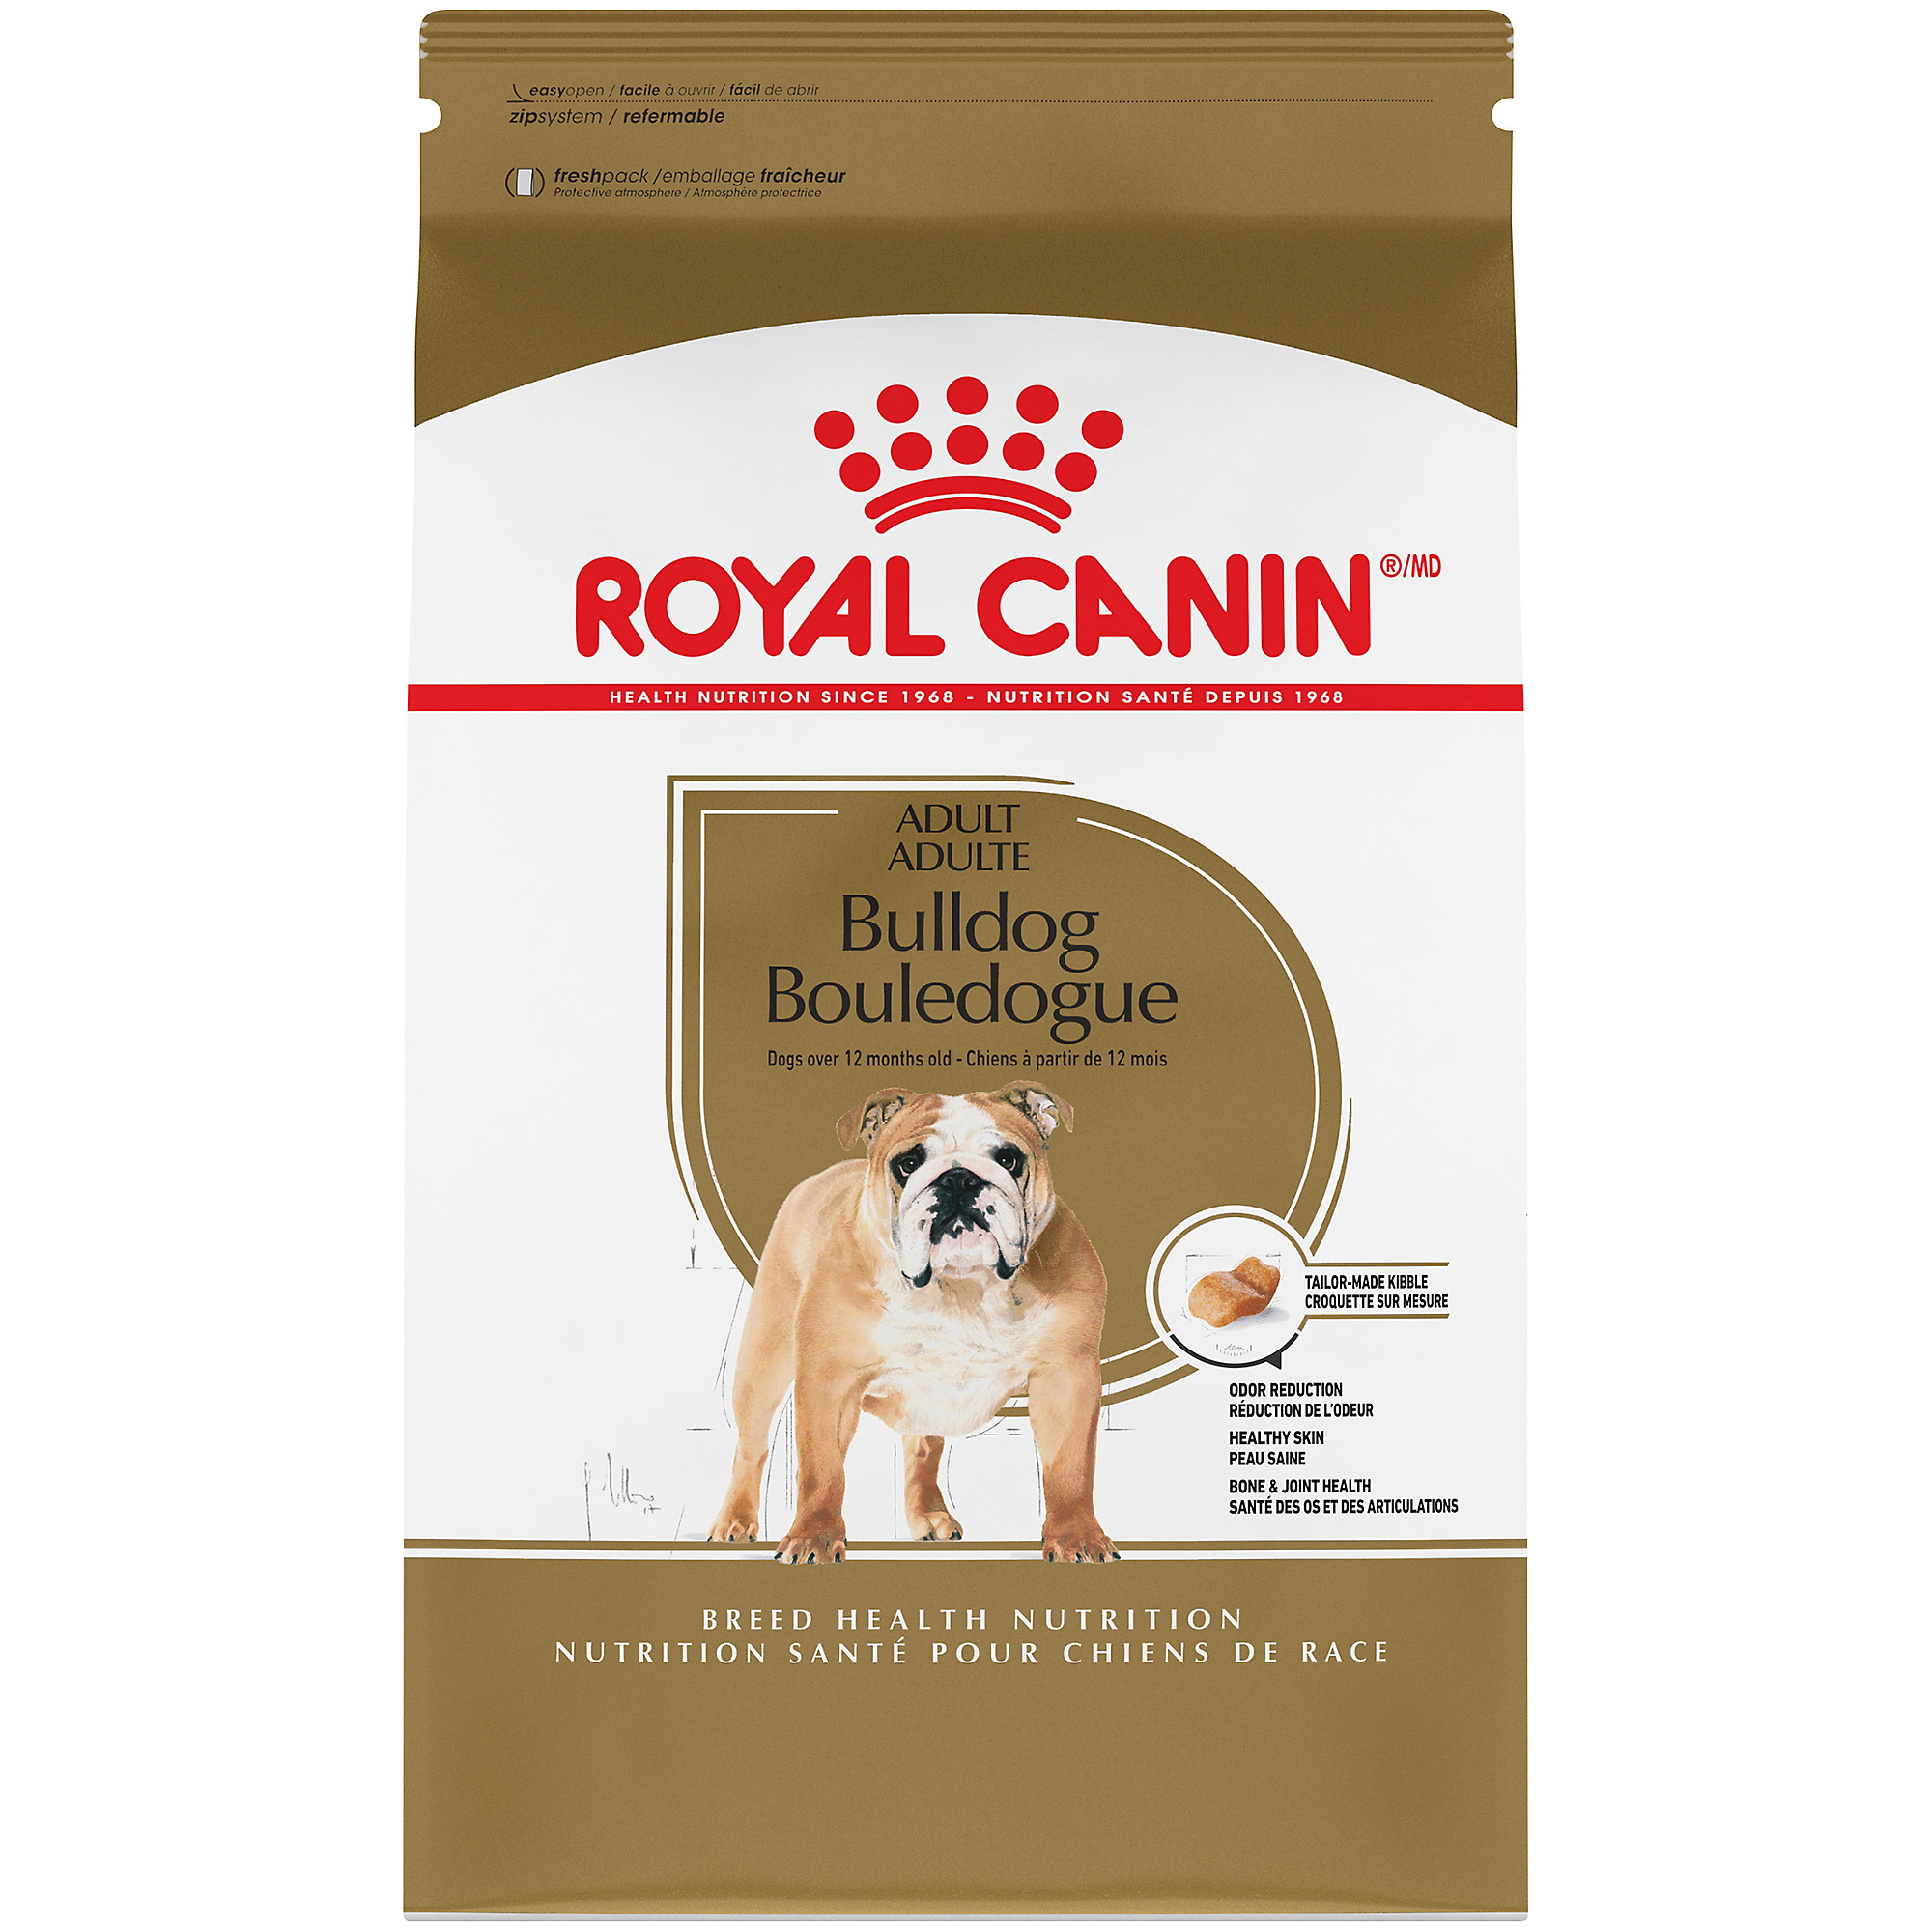 Royal Canin Breed Health Nutrition Bulldog Adult Dry Dog Food Image